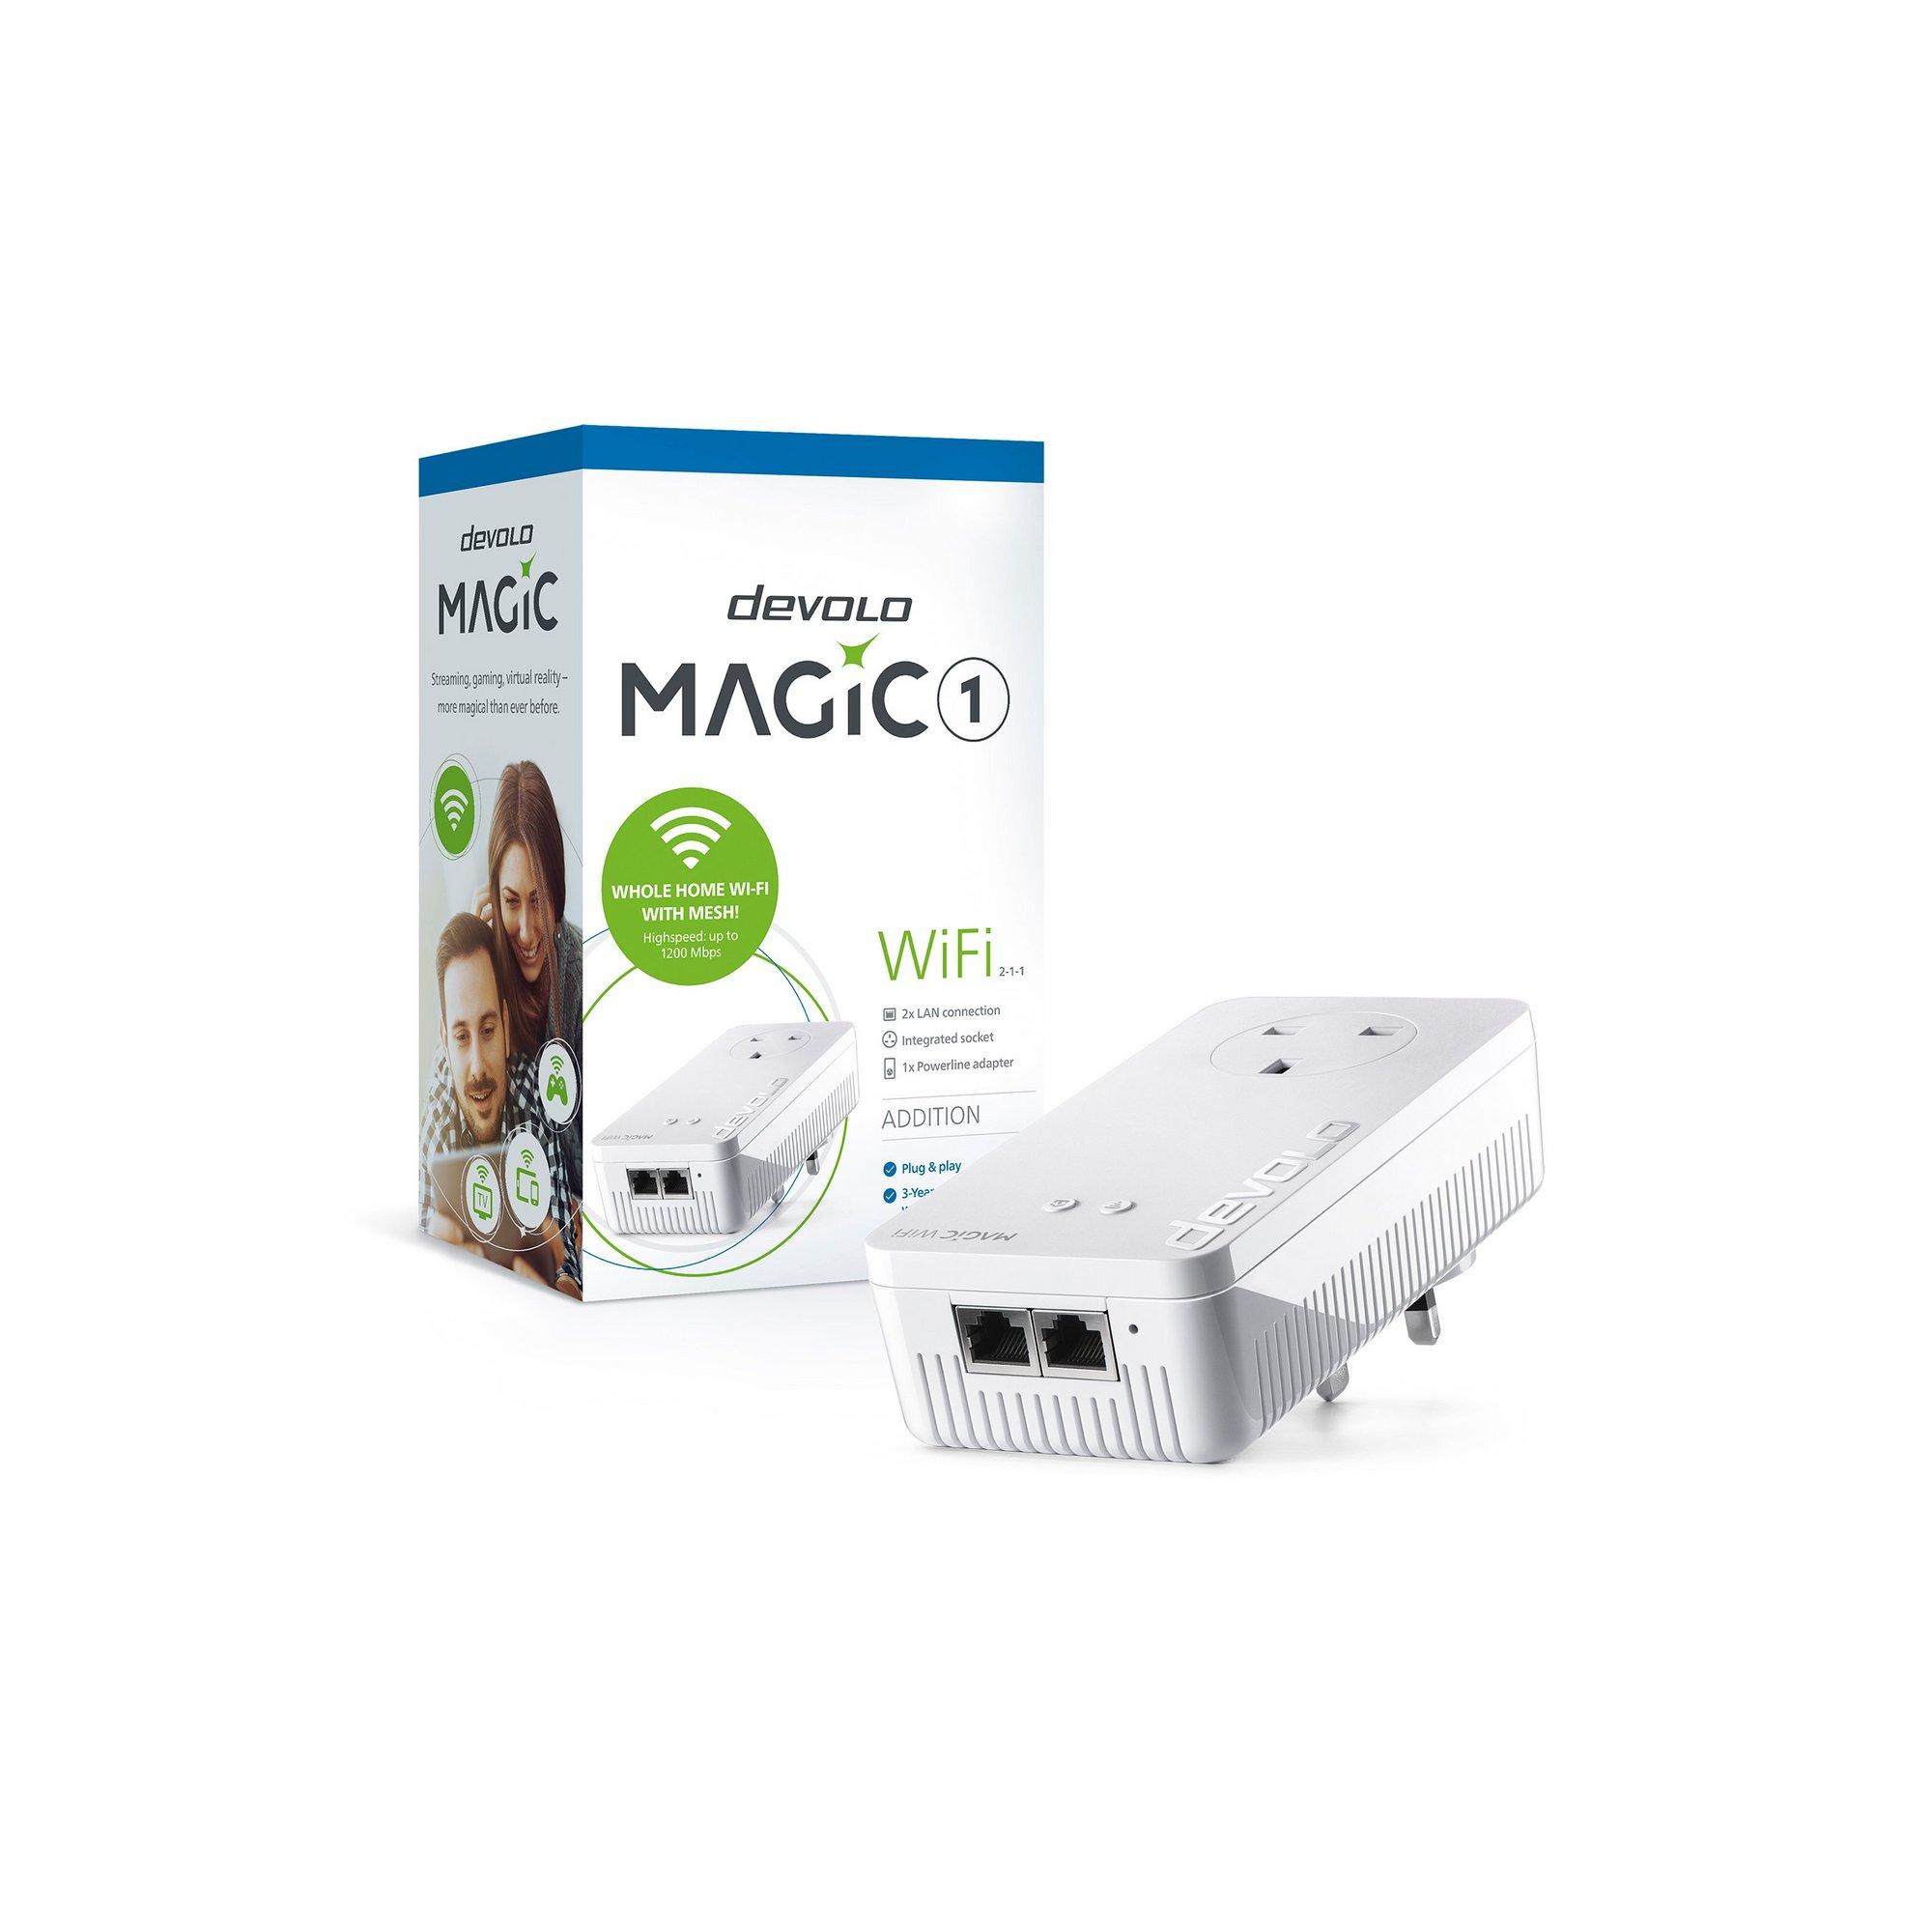 Image of Devolo Magic 1 1200 WiFi Add-On Adapter